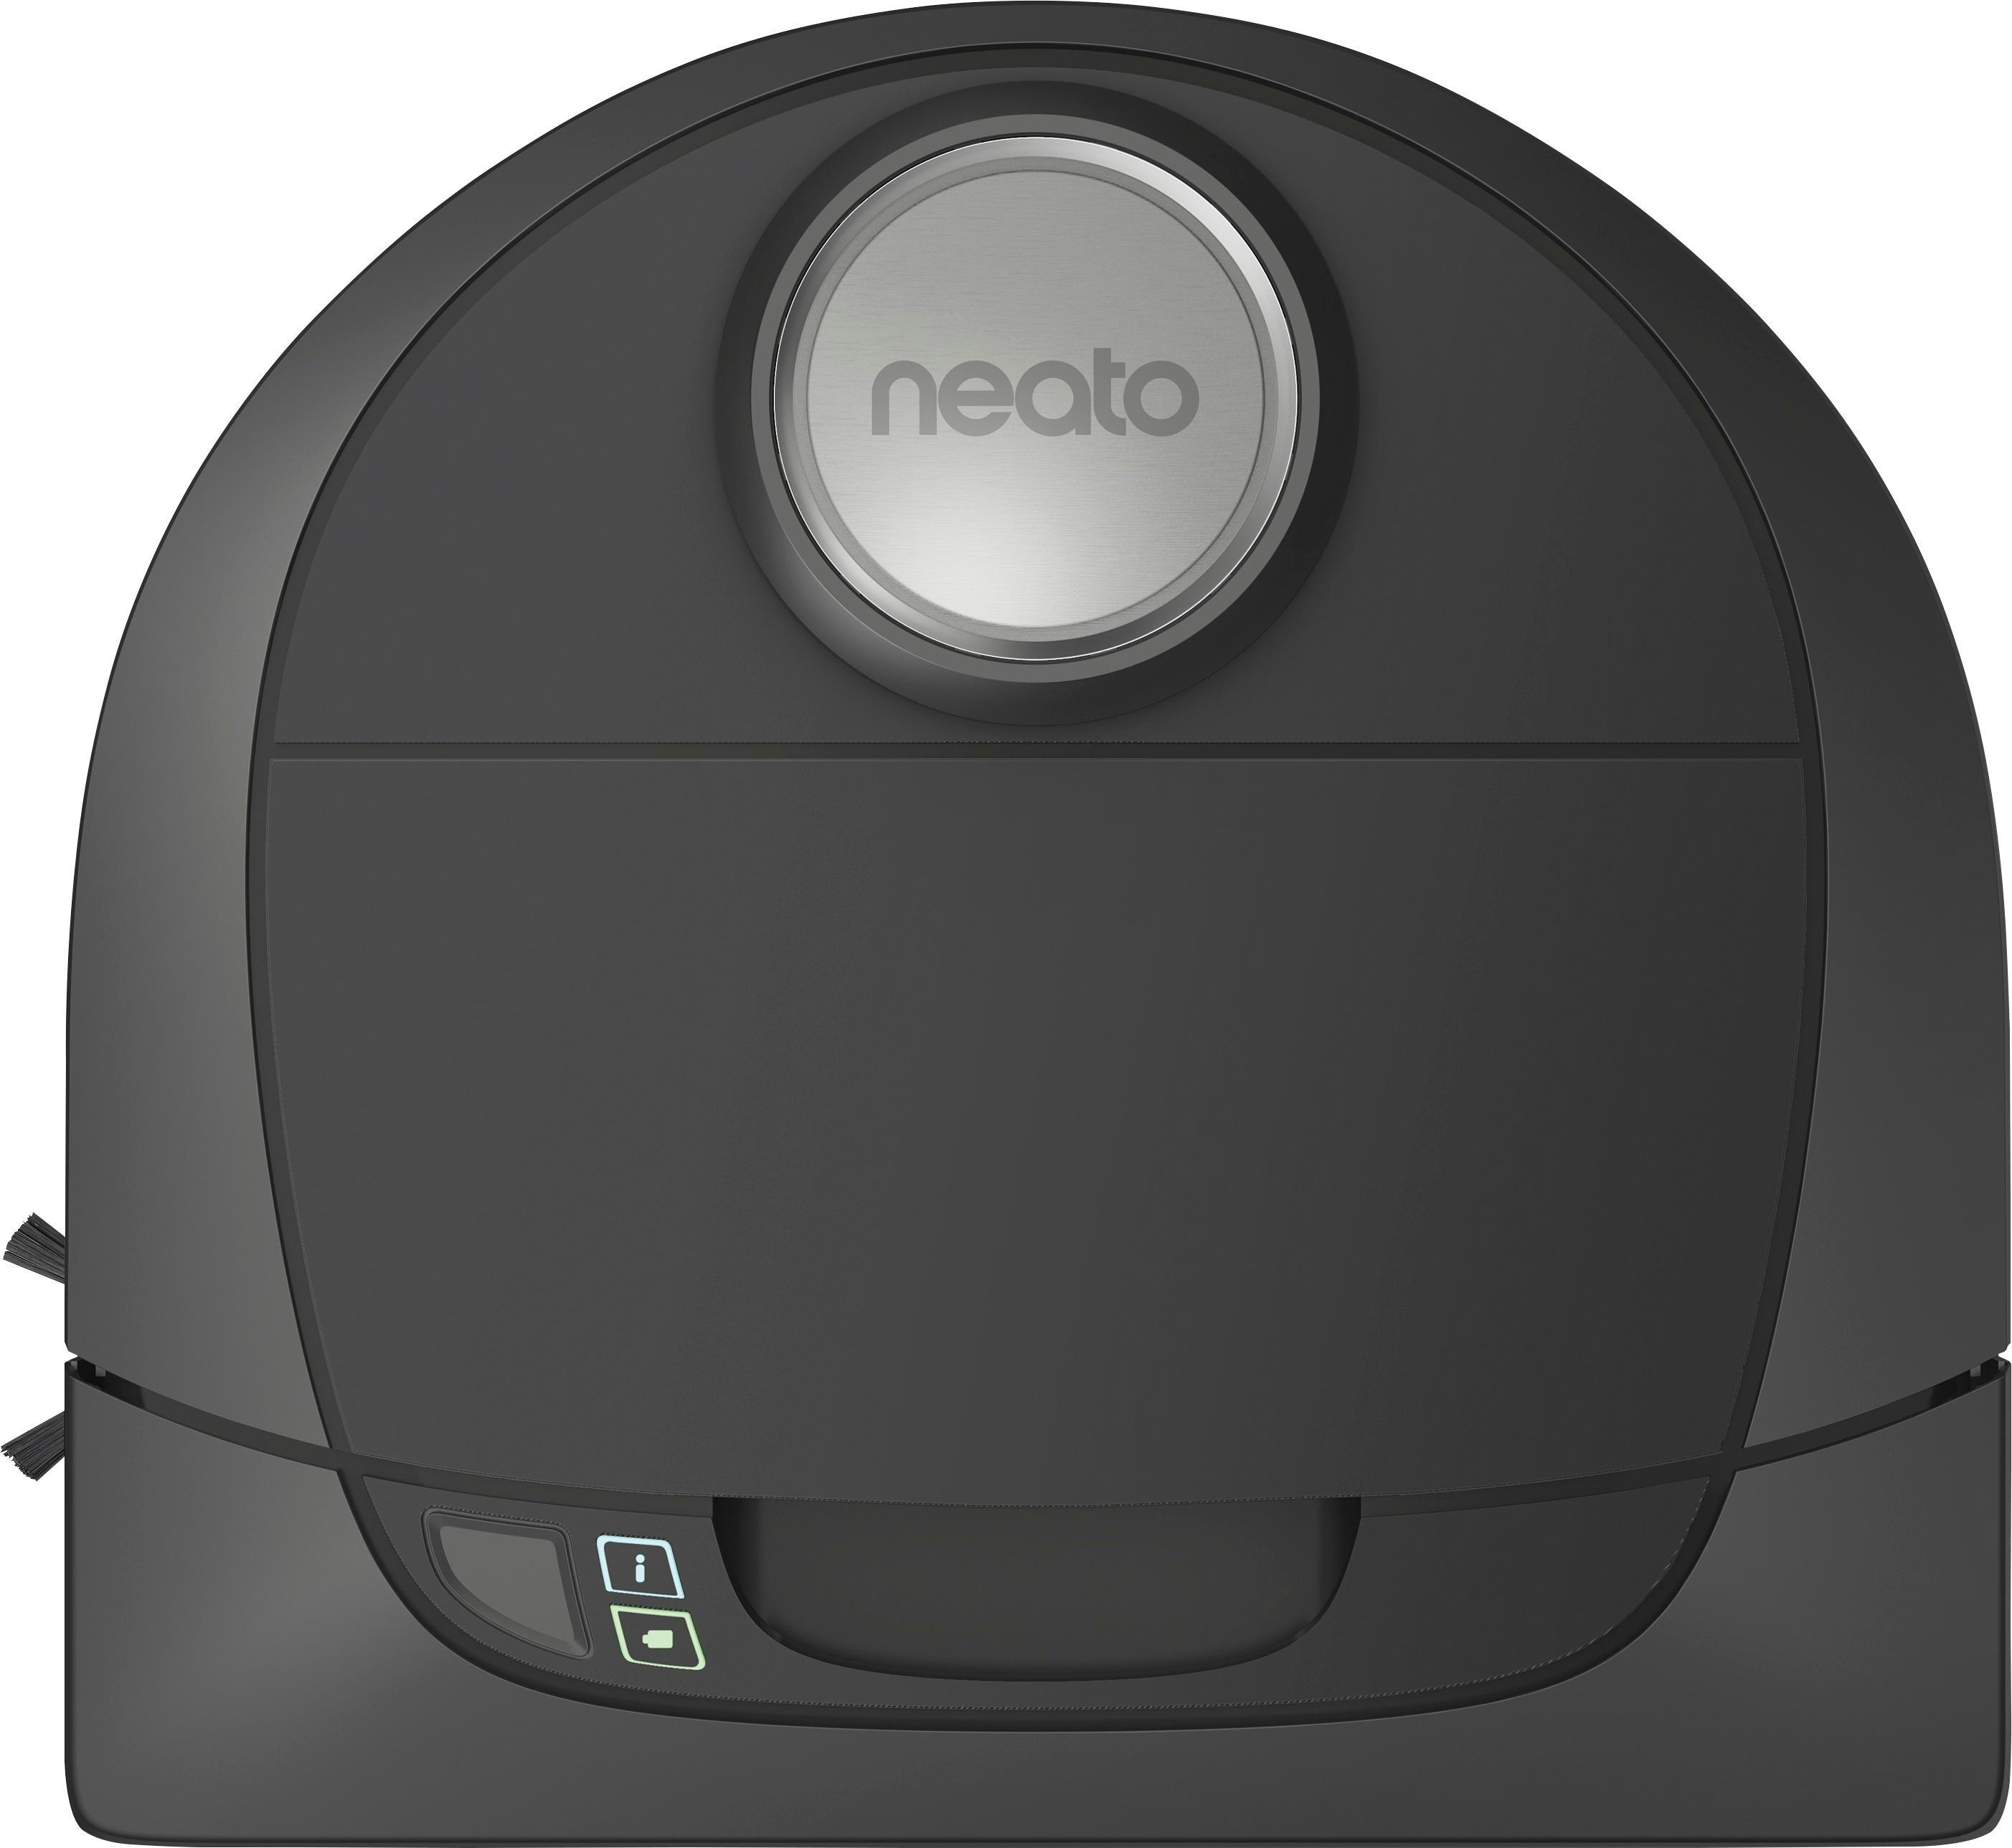 Neato Robotics Botvac D5 App-Controlled Robot Vacuum Black 945-0228